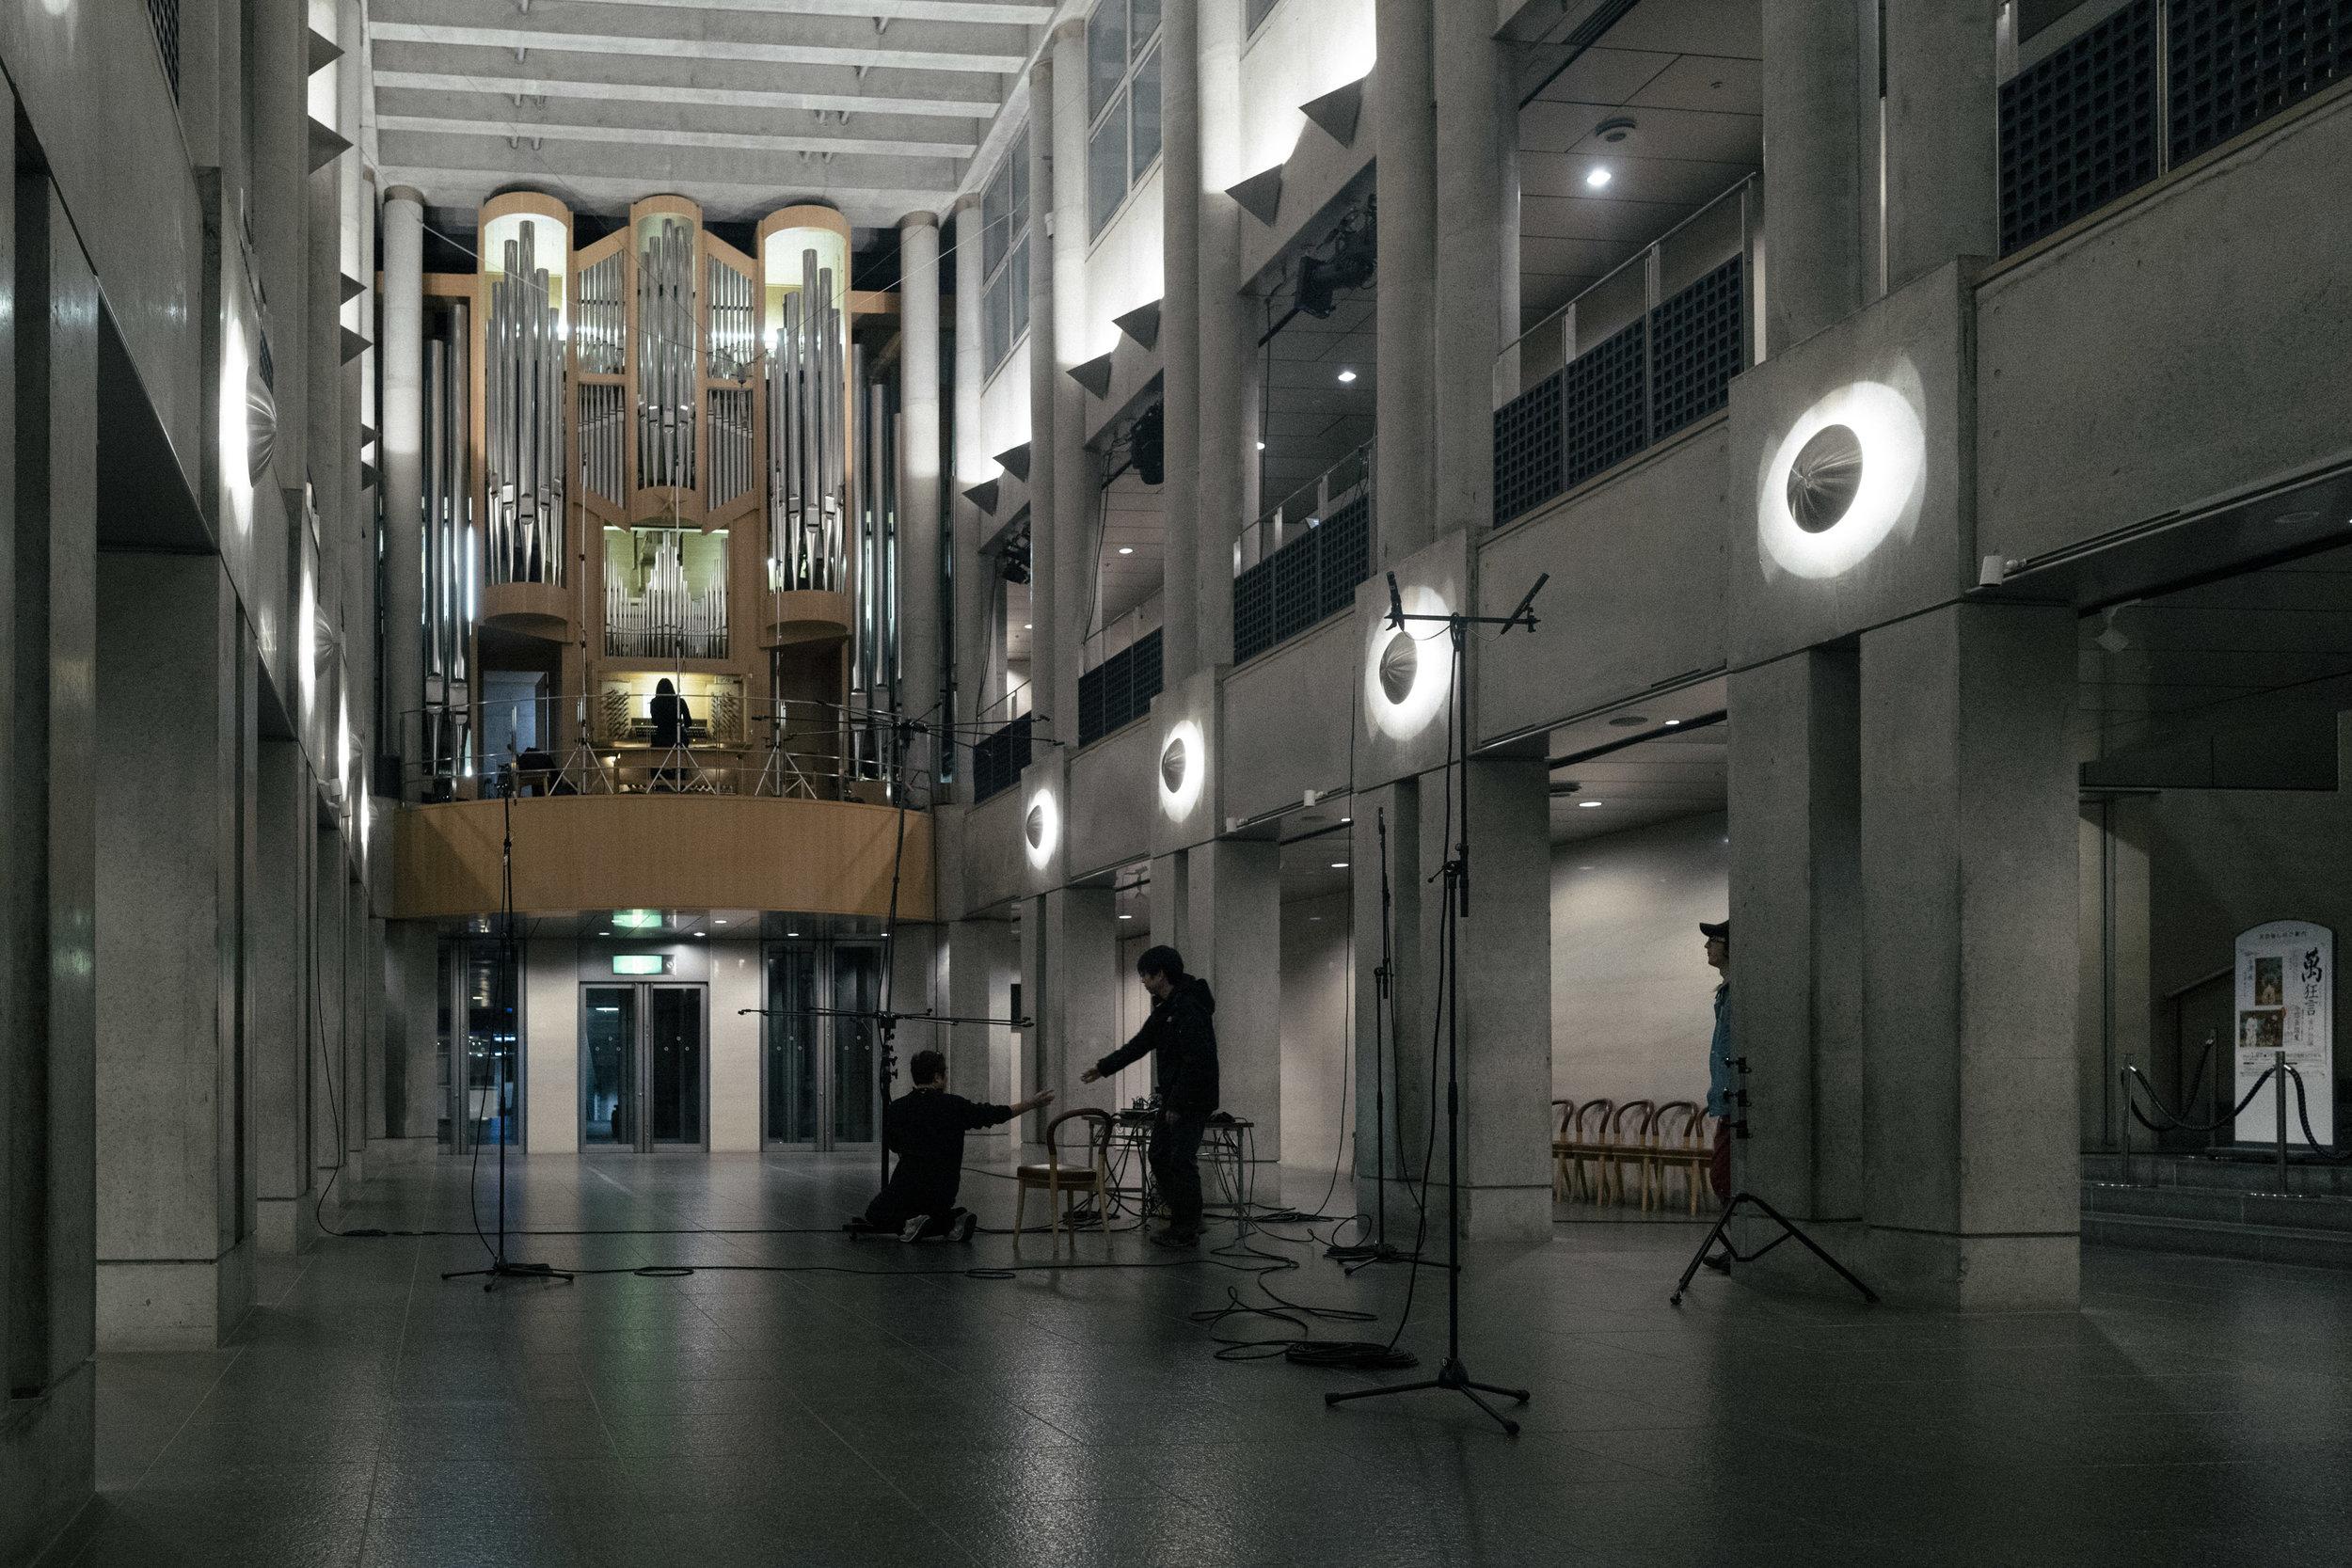 Pipe organ recording